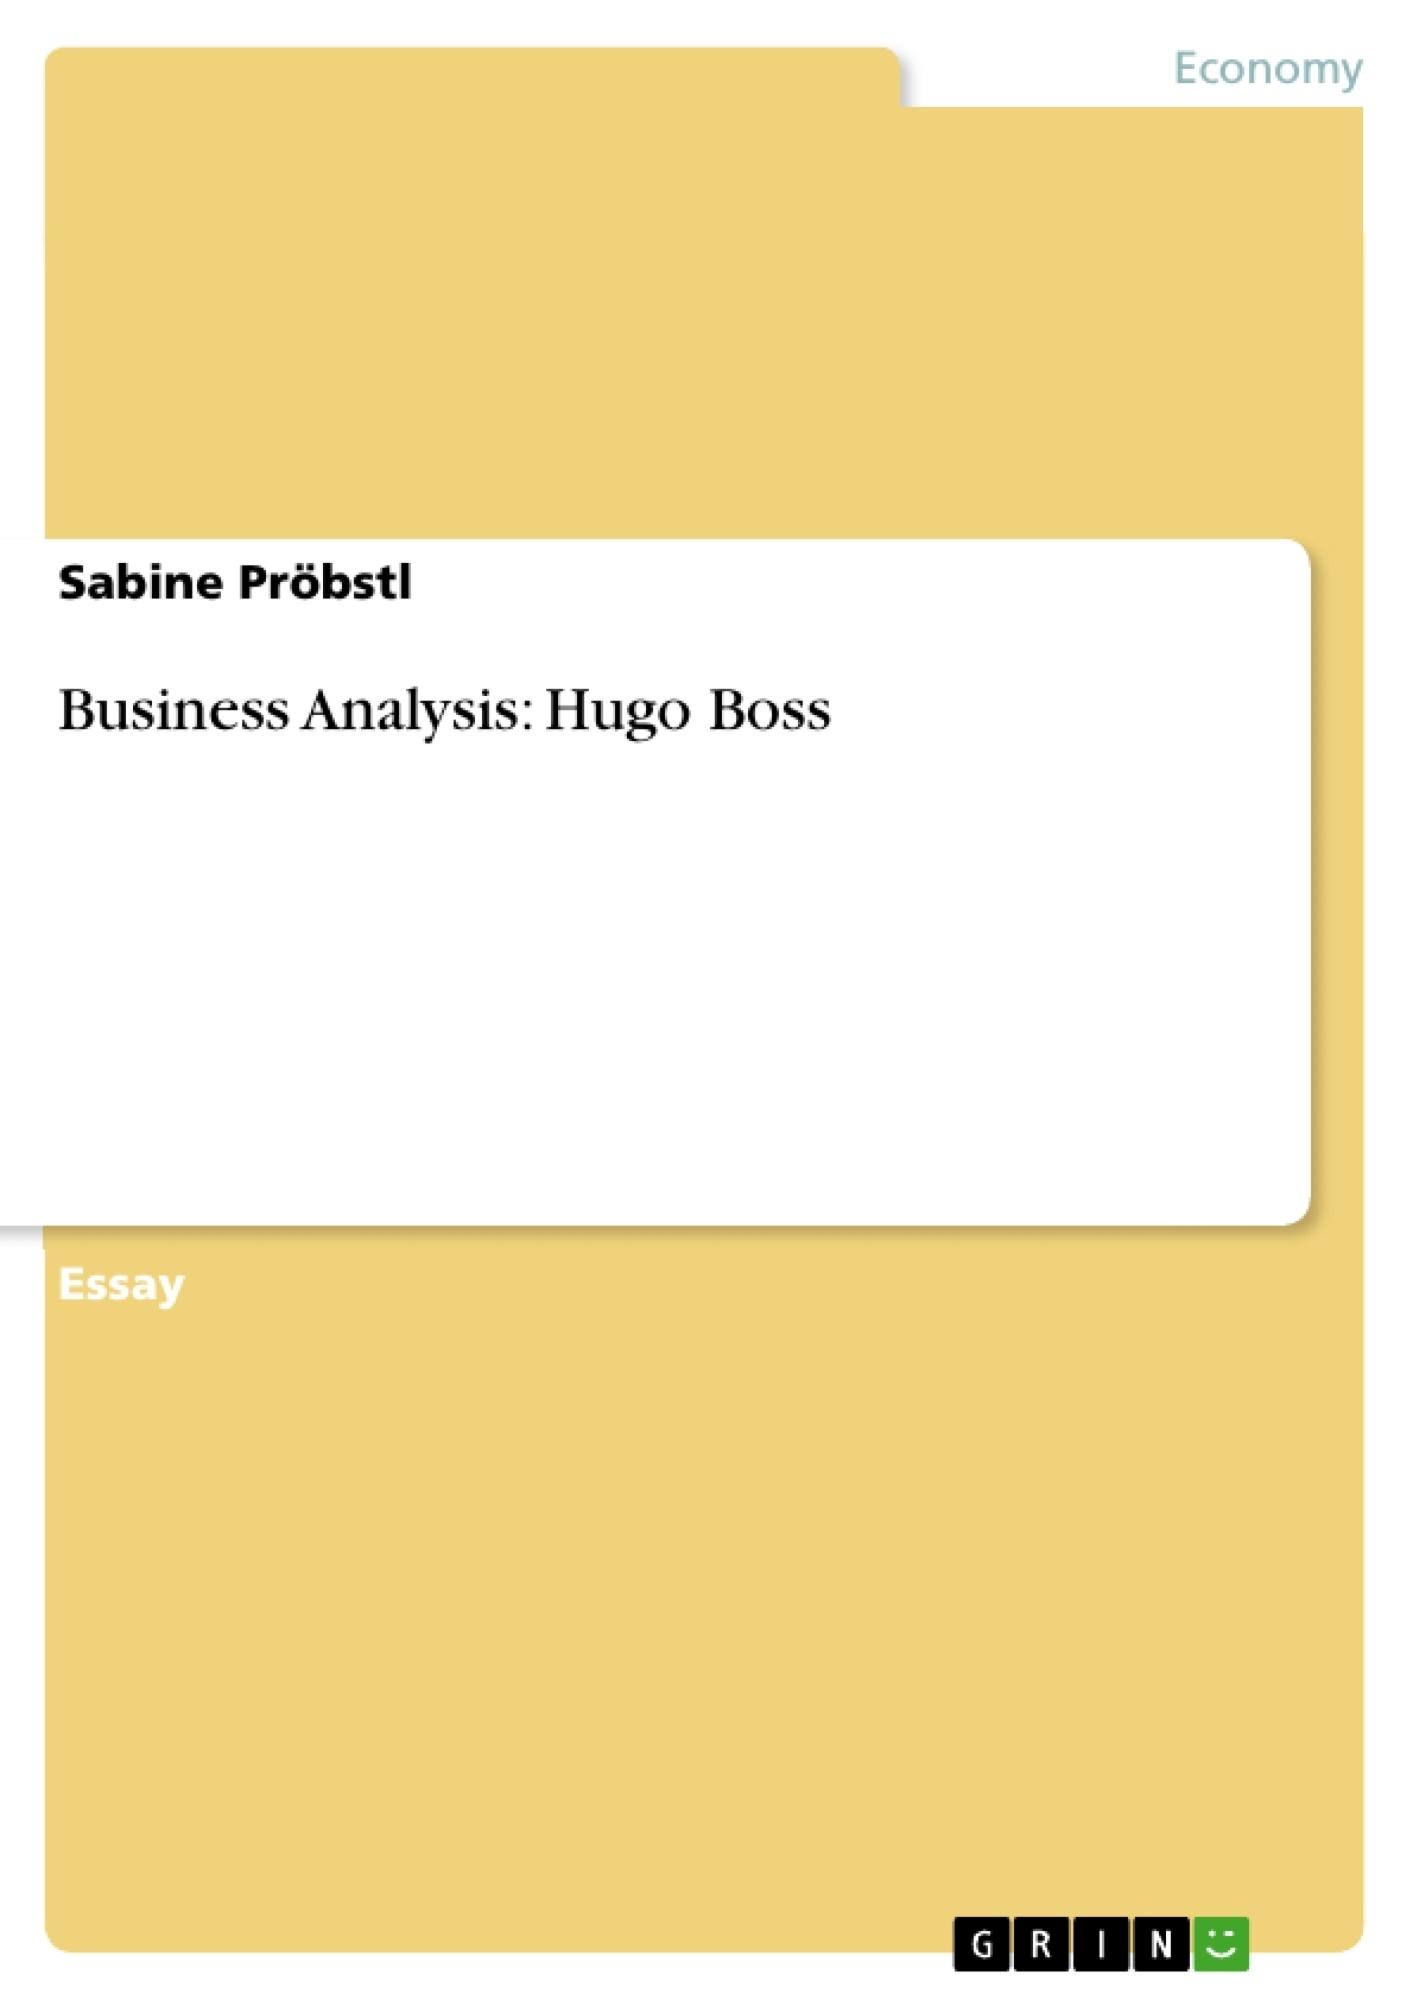 Title: Business Analysis: Hugo Boss